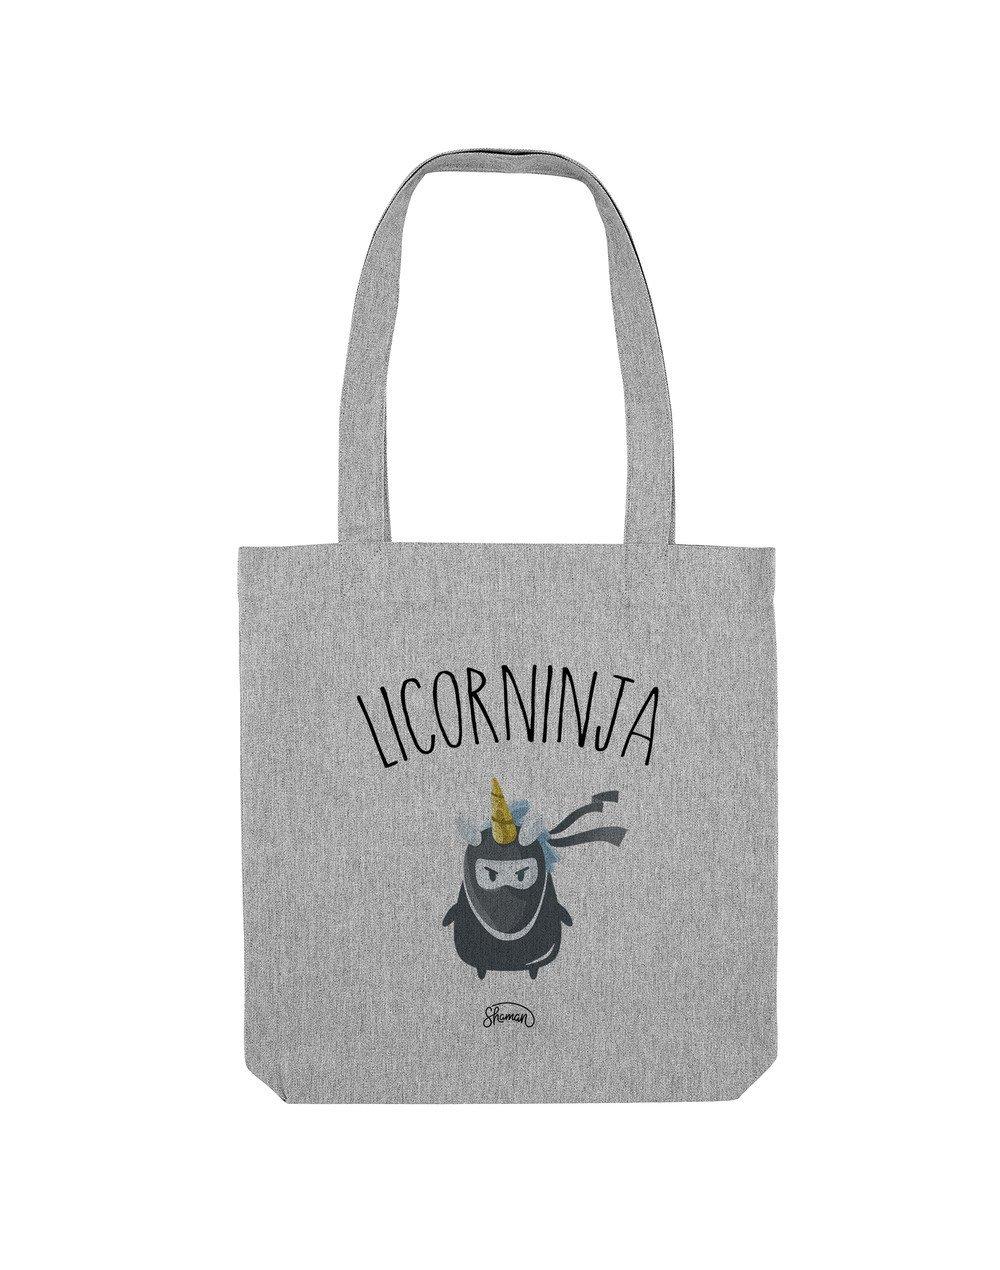 "Tote Bag ""Licorninja"""